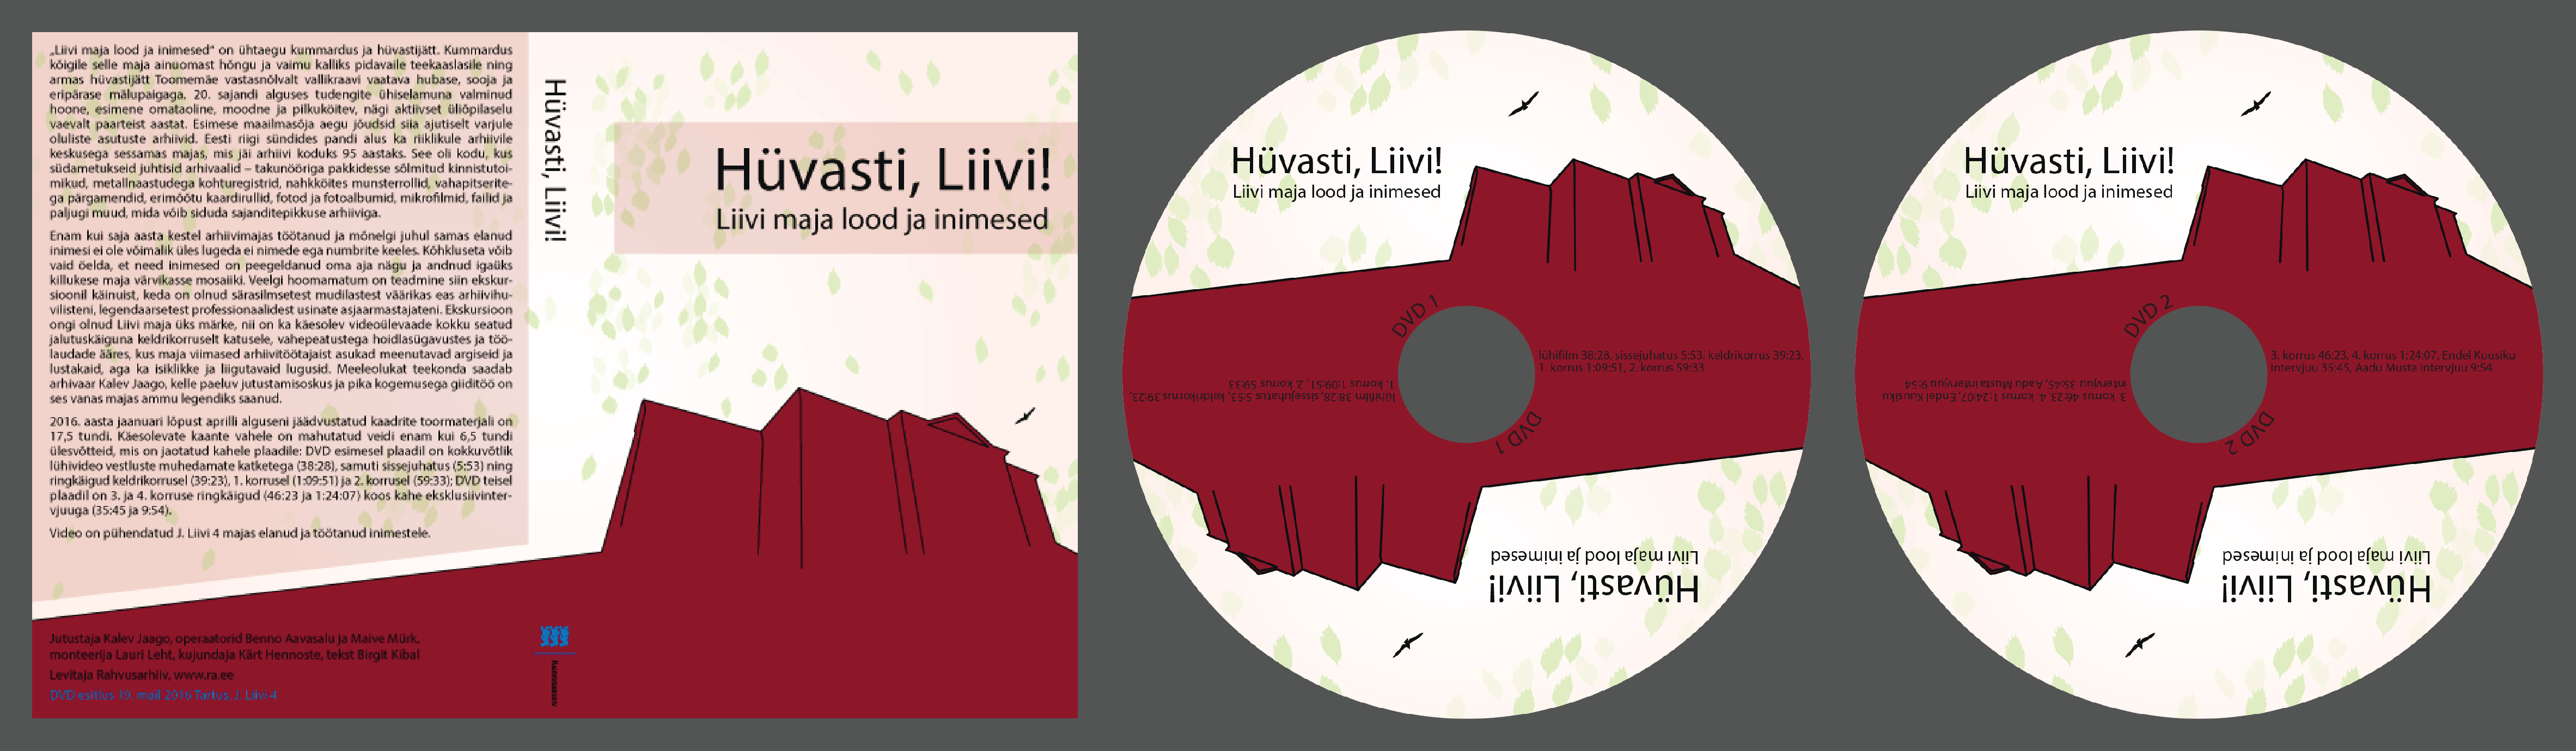 DVD kujundus